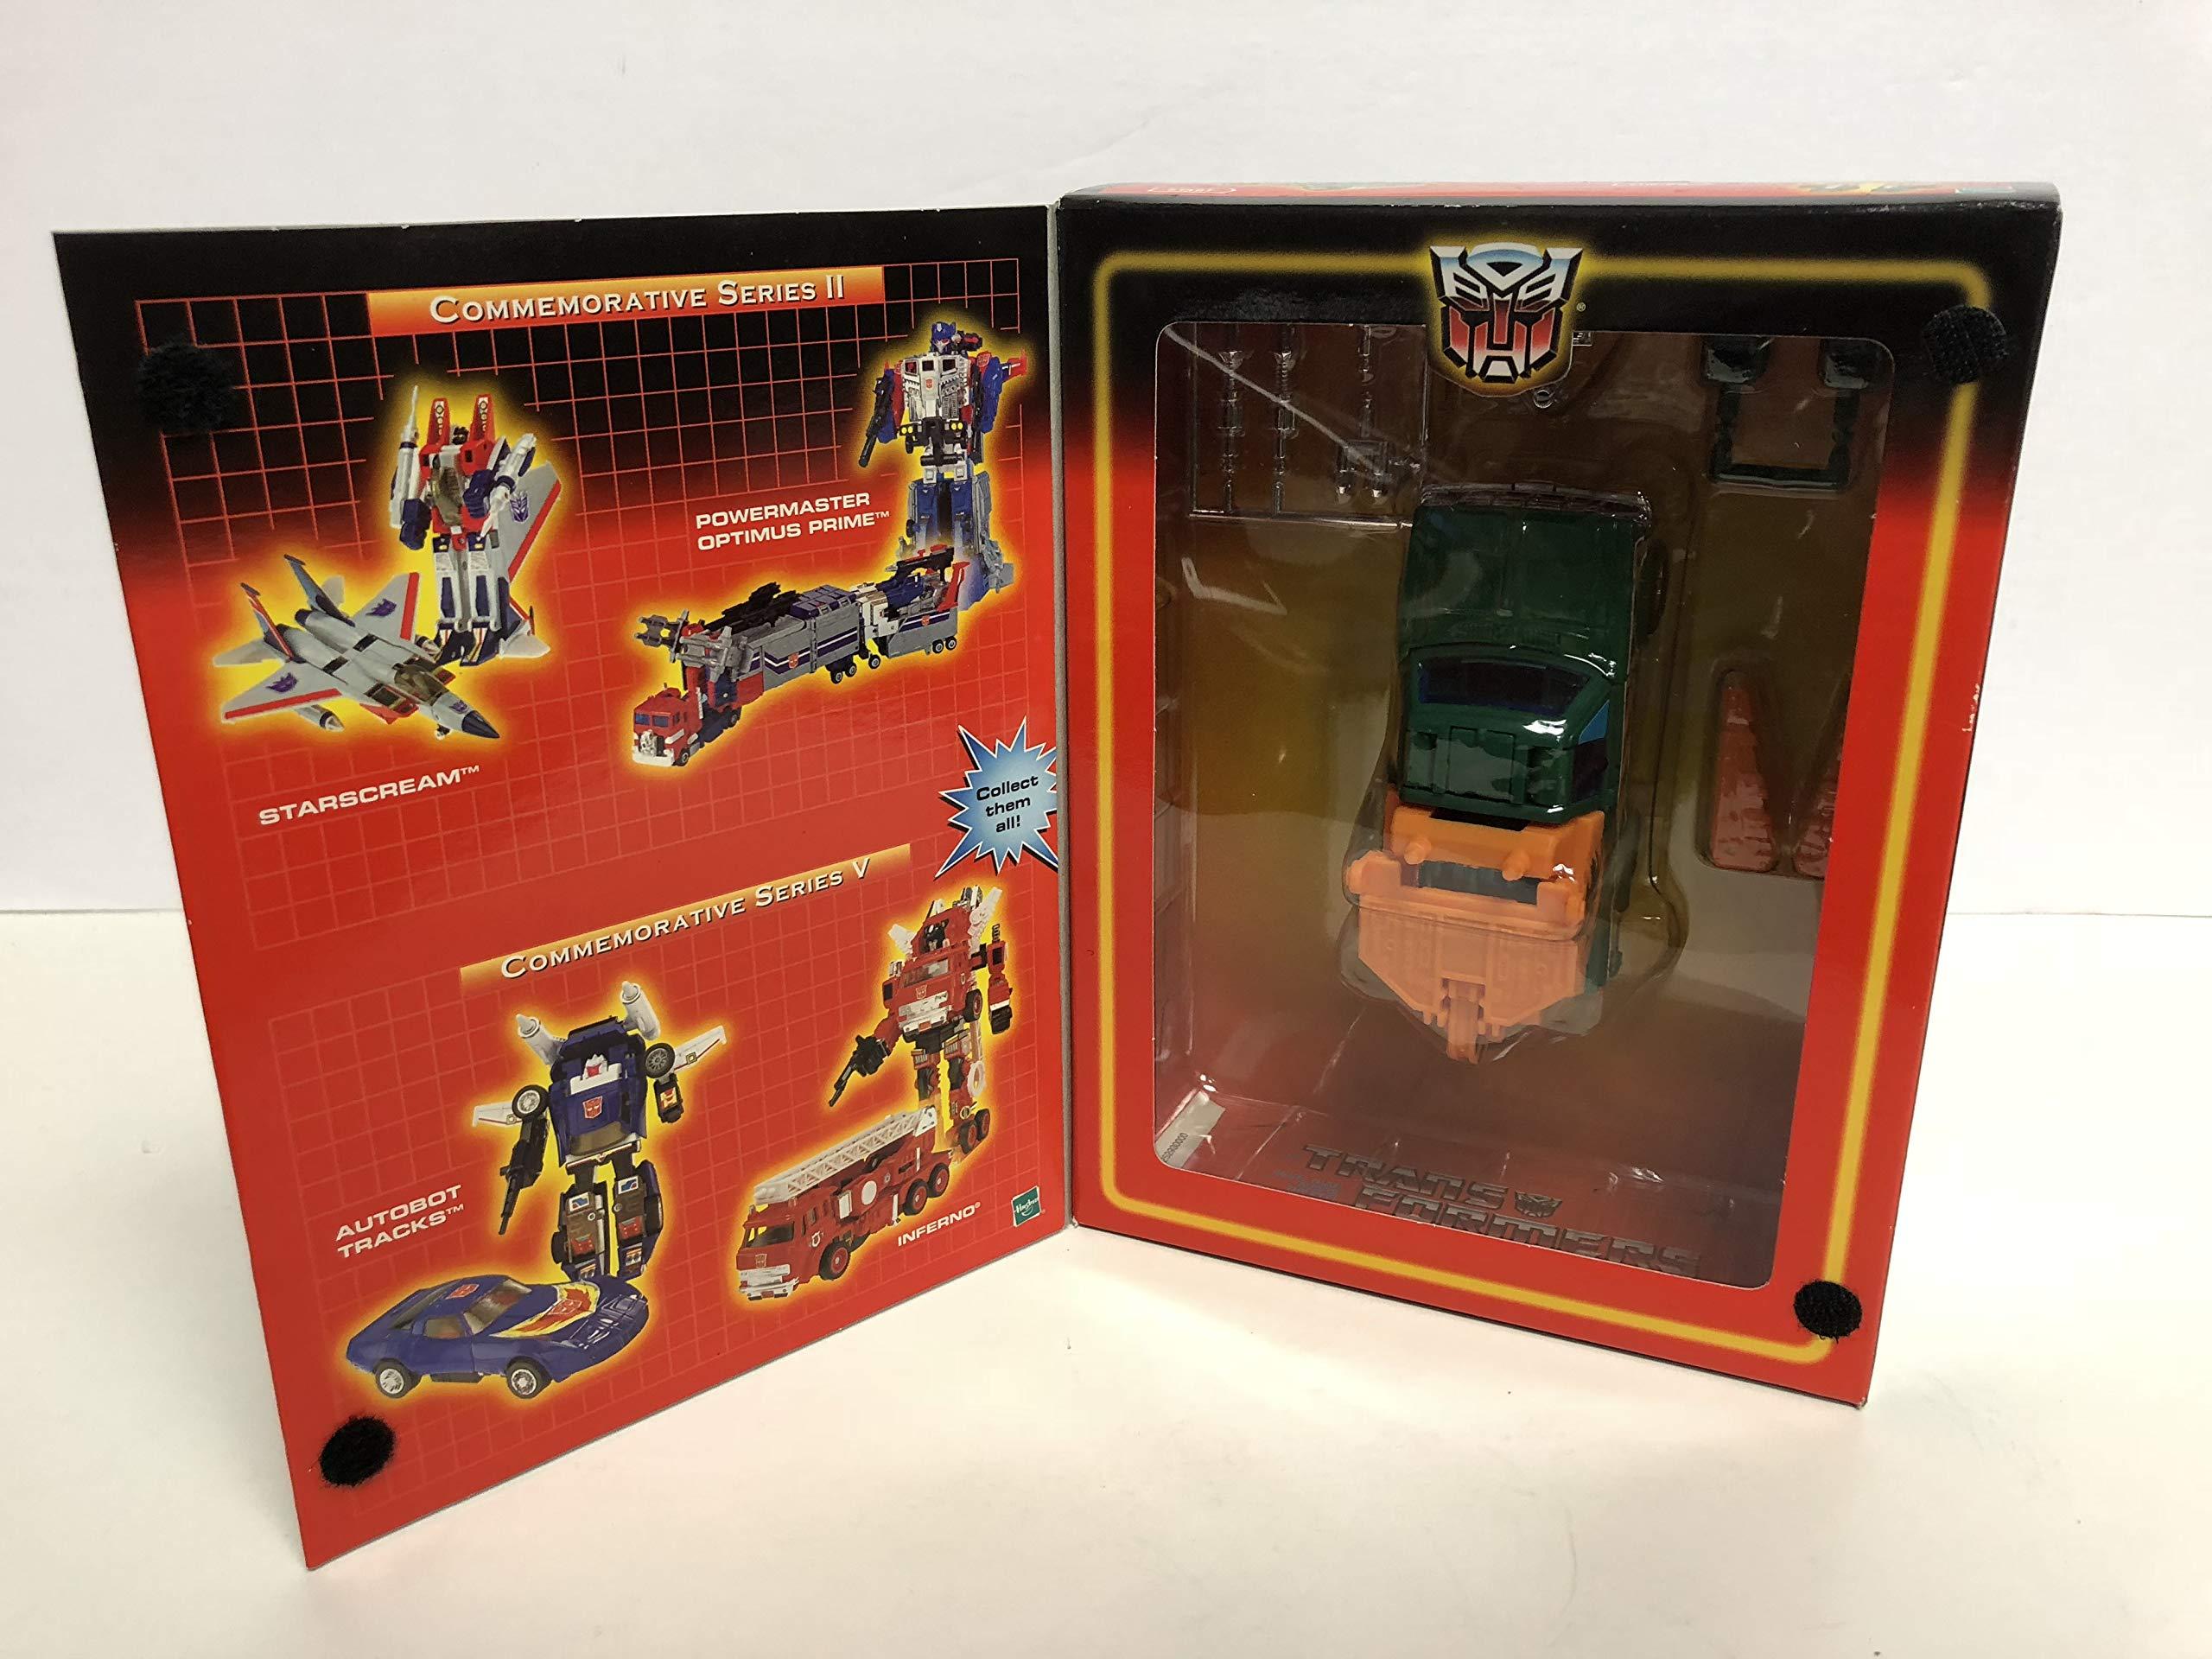 HOIST Transformers Autobot Hasbro COMMEMORATIVE SERIES V G1 RE ISSUE